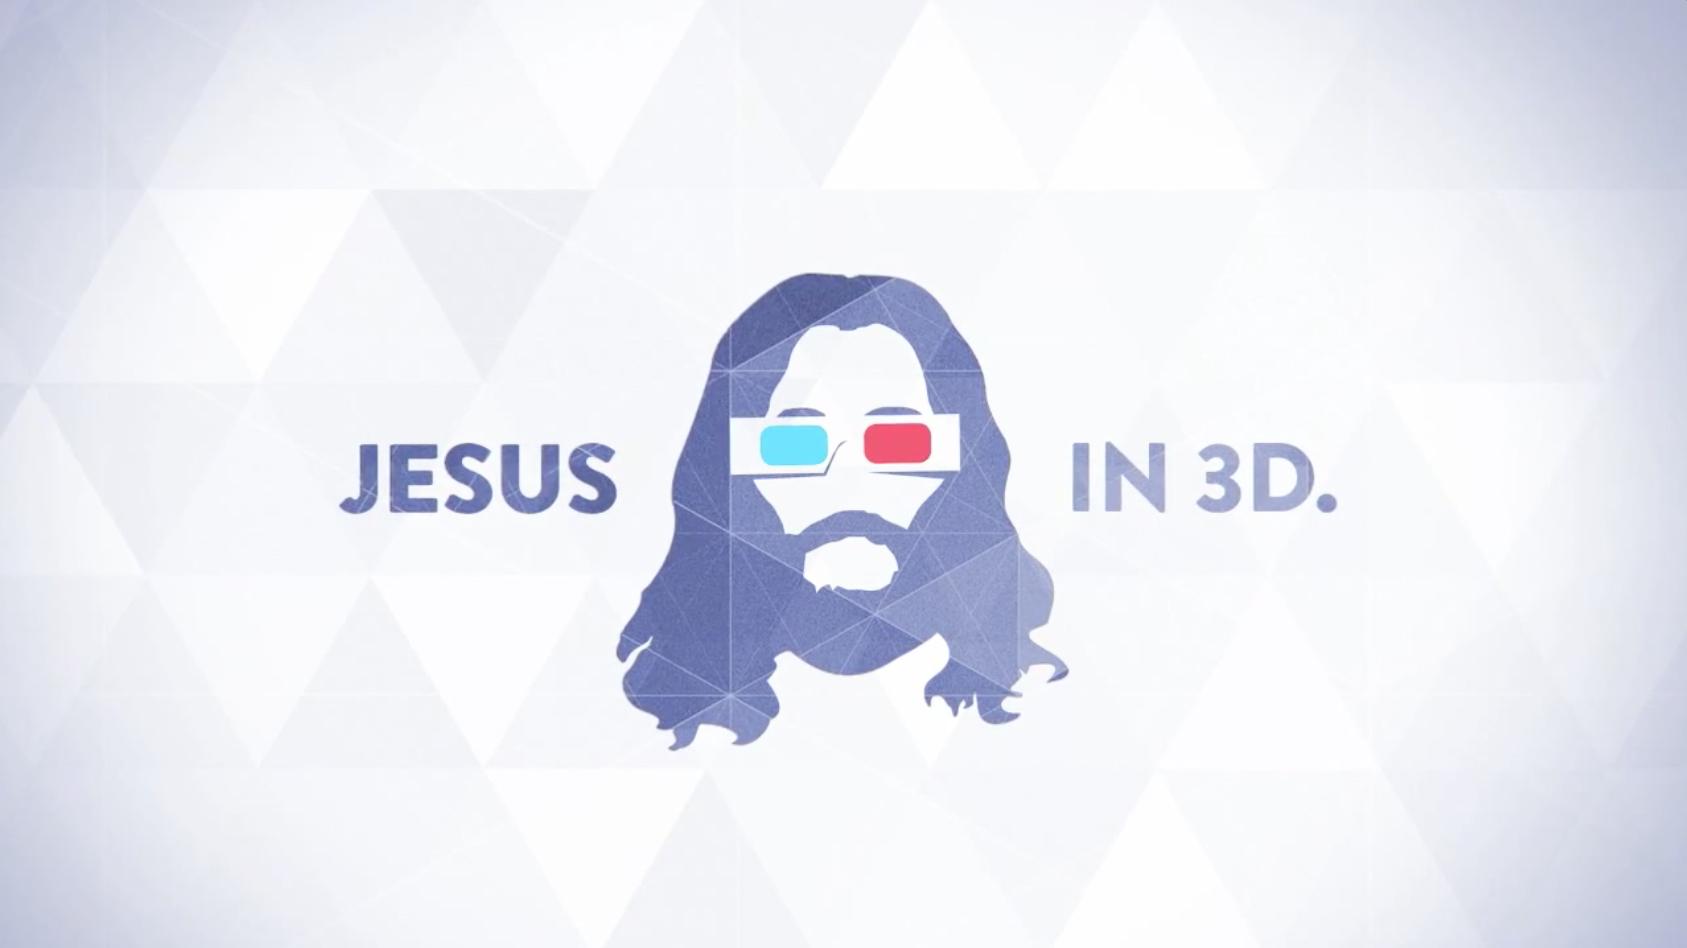 JESUS IN 3D (BIG).jpg